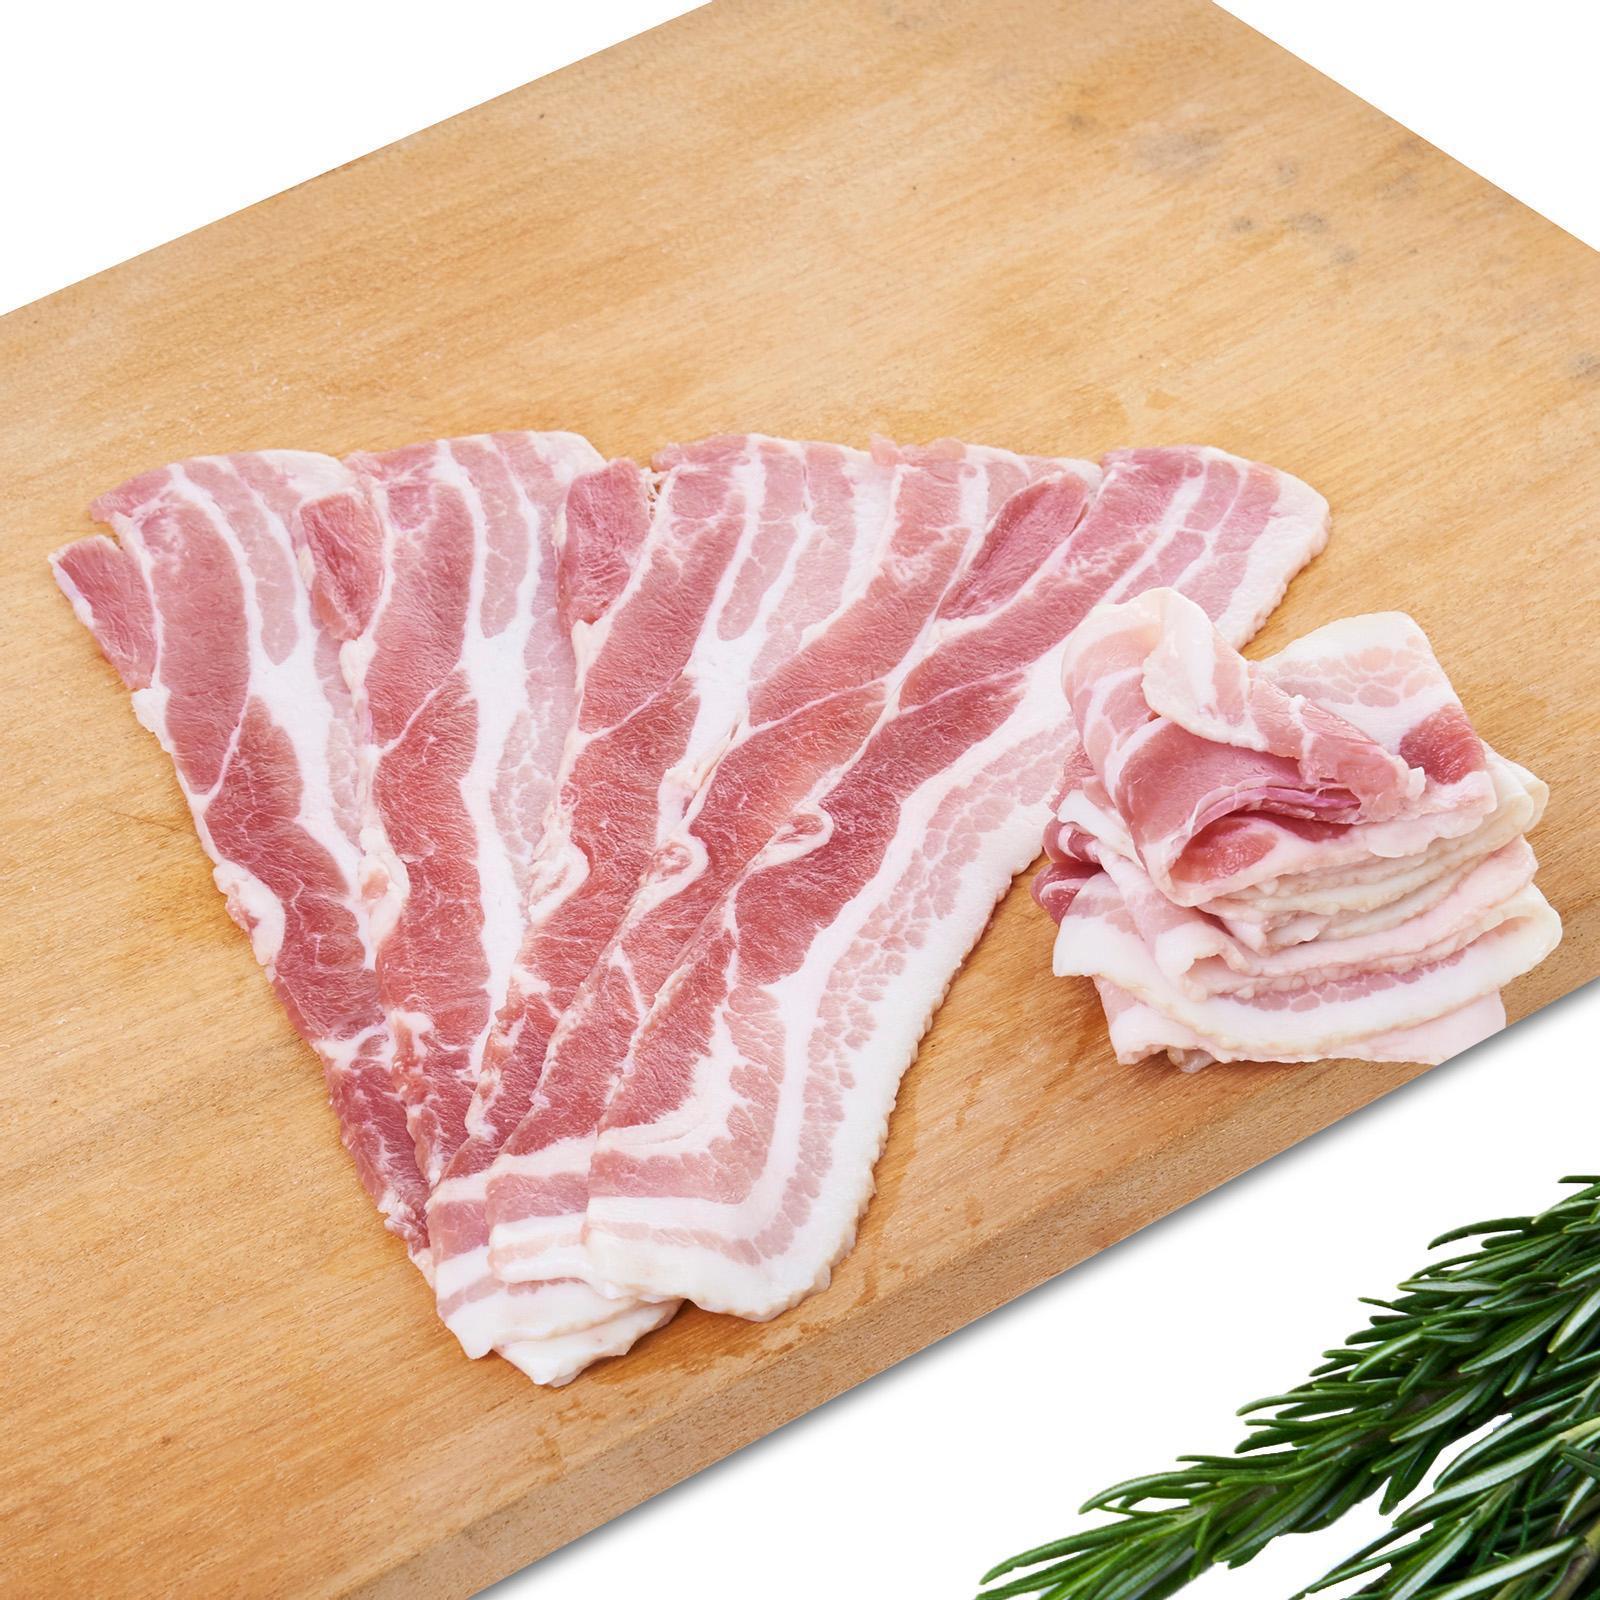 Tulip Streaky Bacon Presliced - Frozen - The Cellar Door